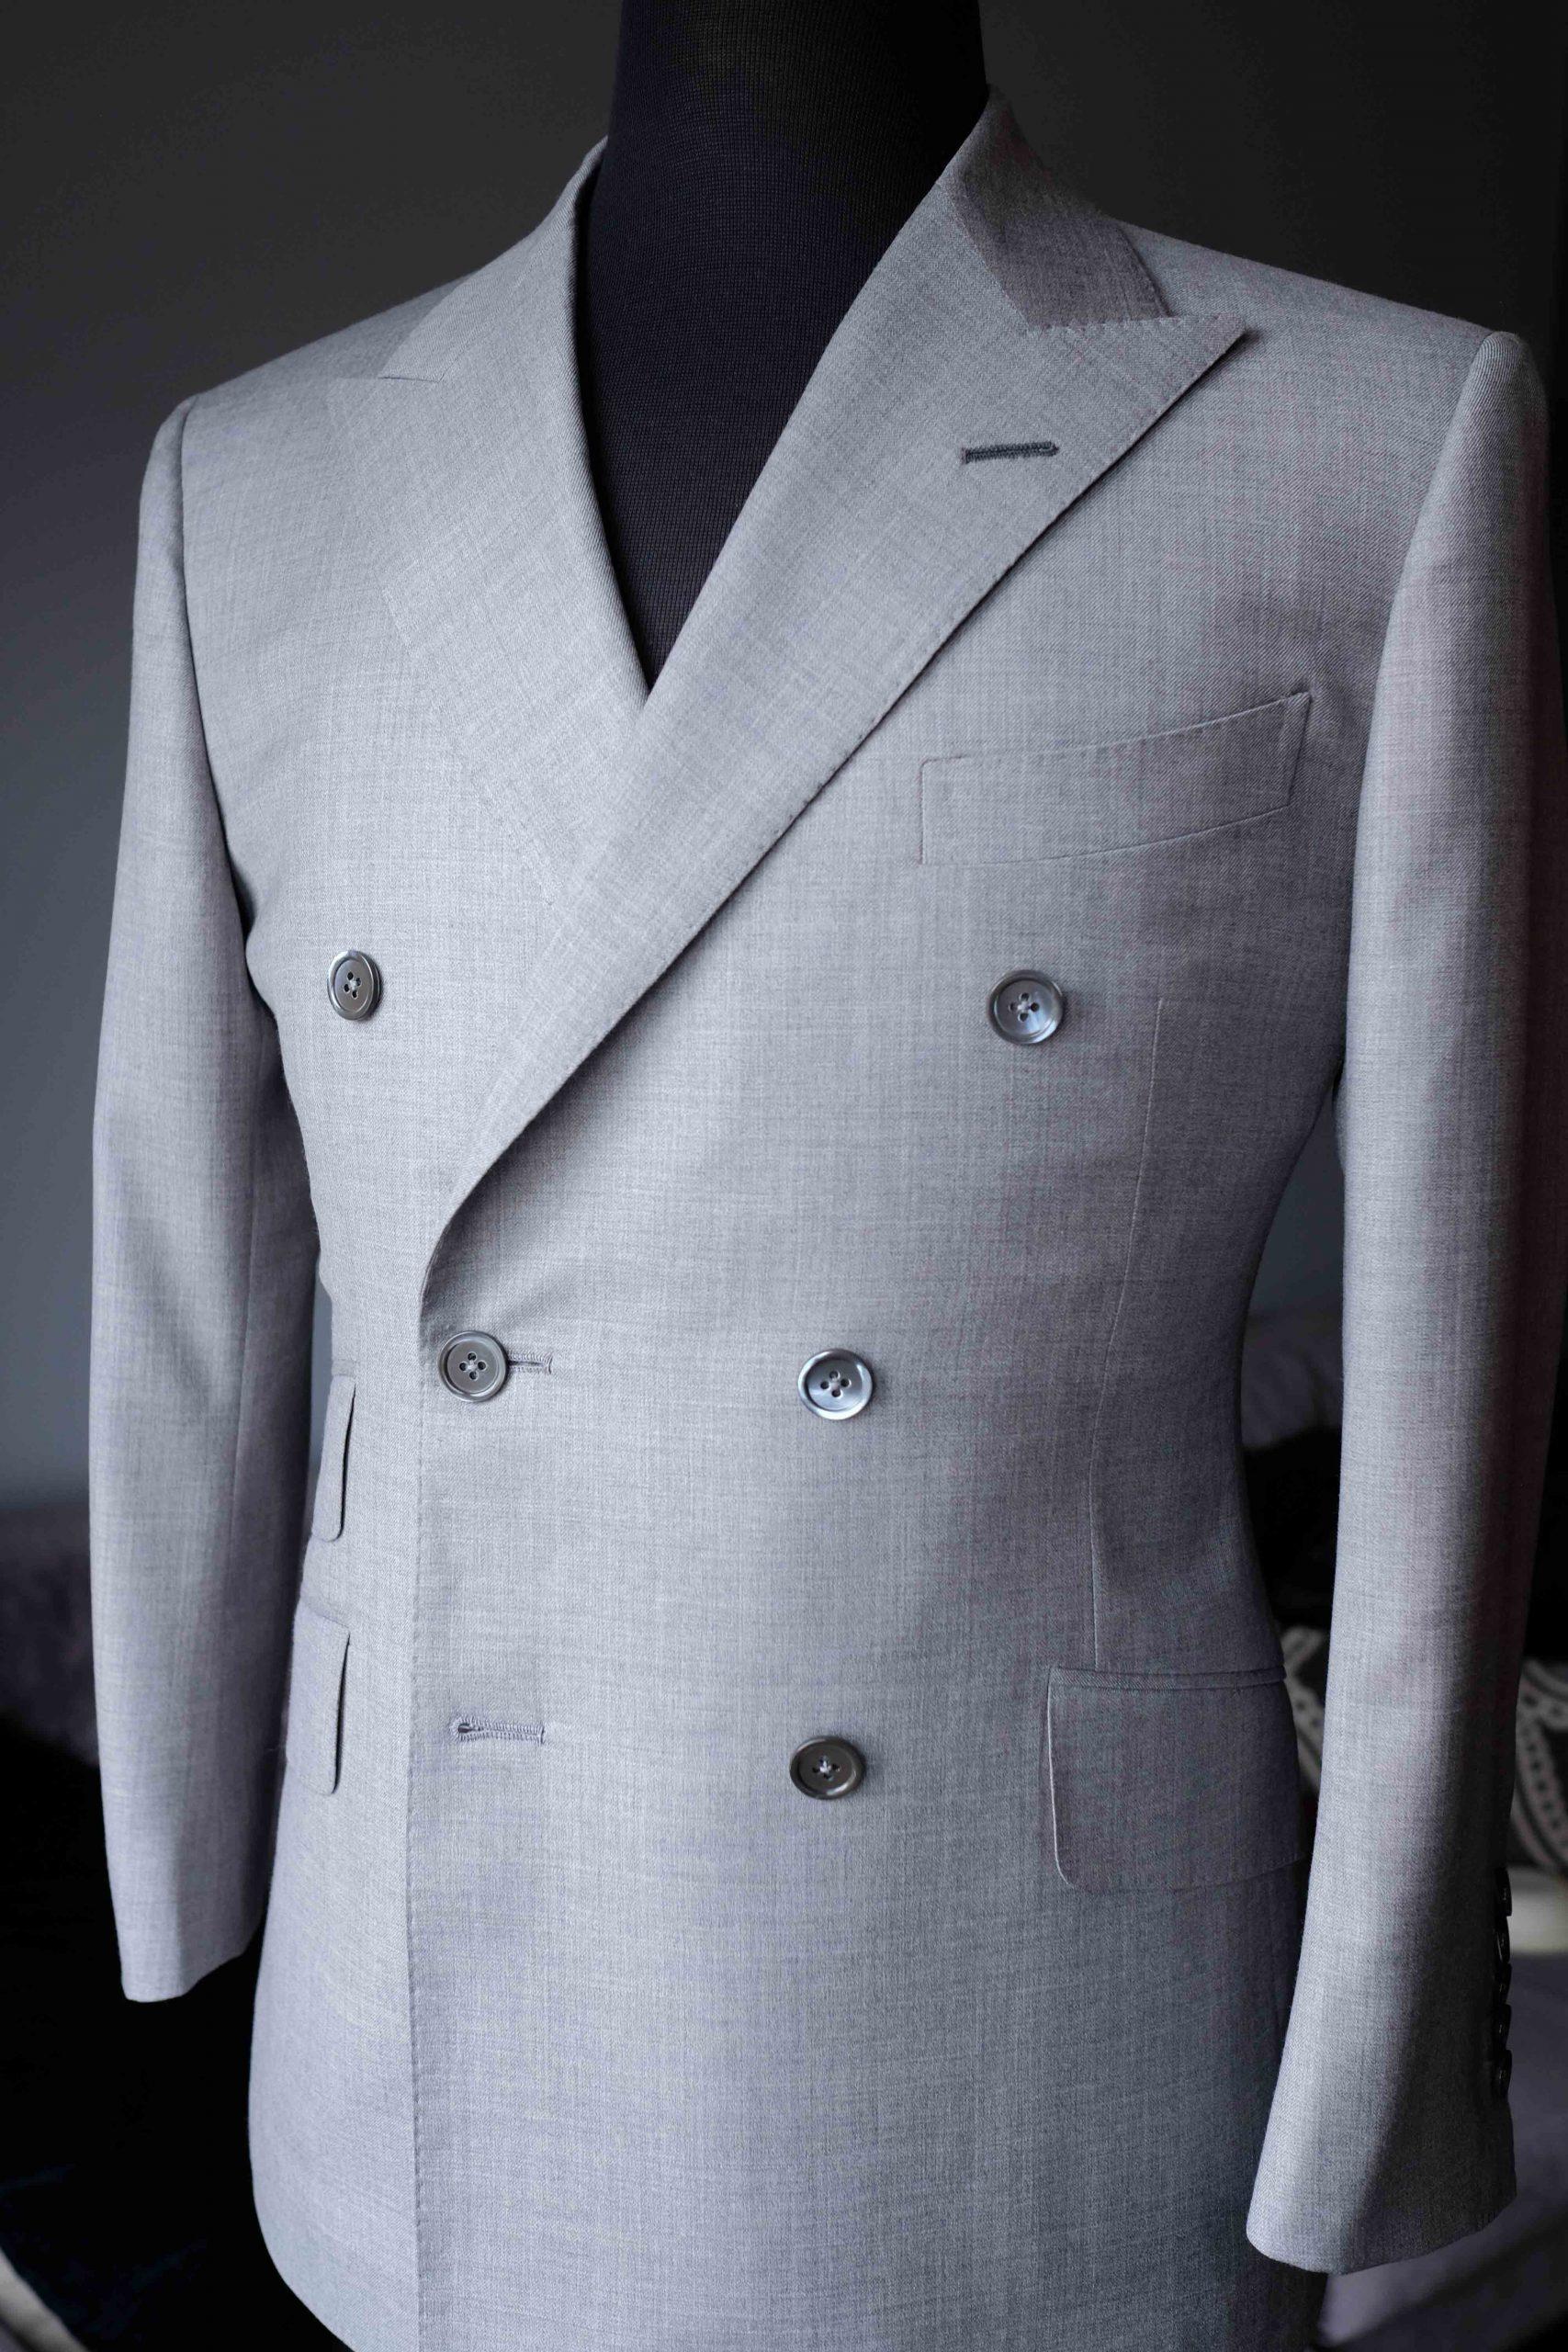 Grey Double Breasted Suit - Cerruti - Toronto